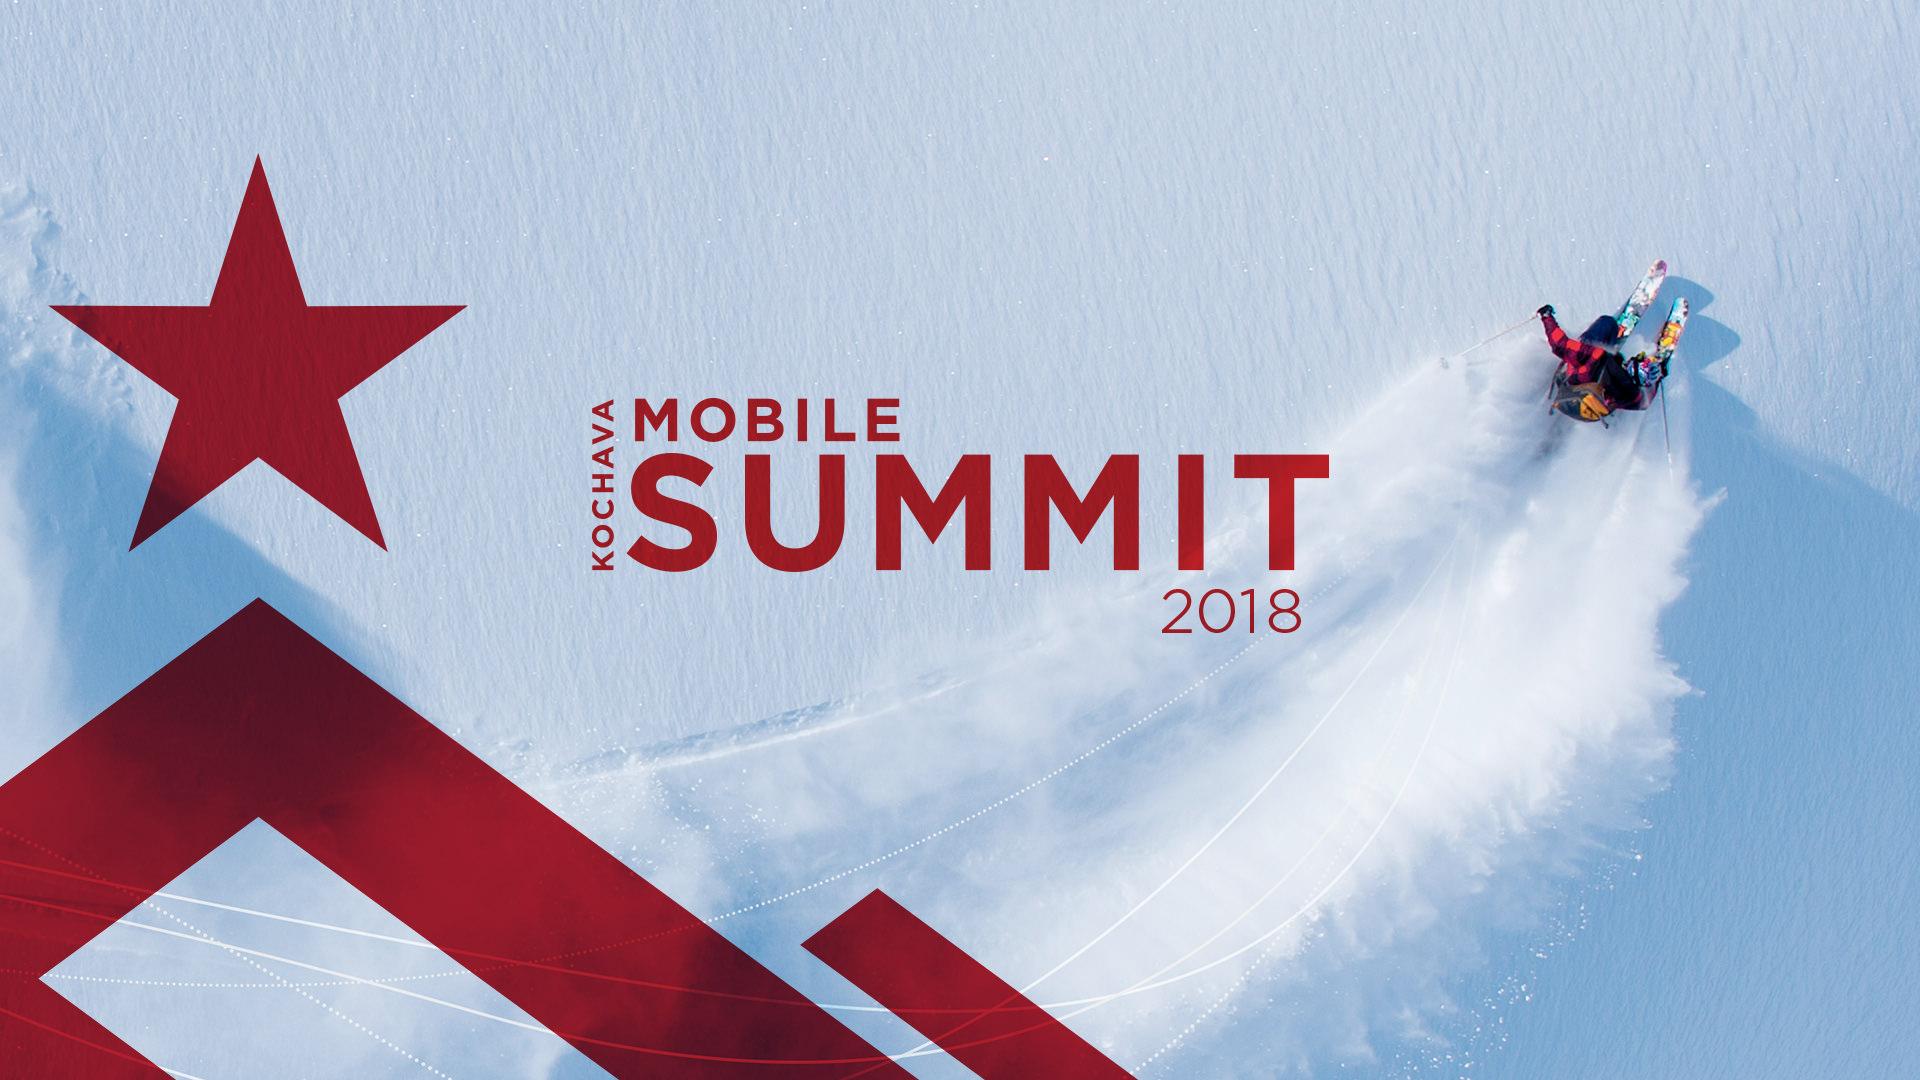 Kochava Mobile Summit